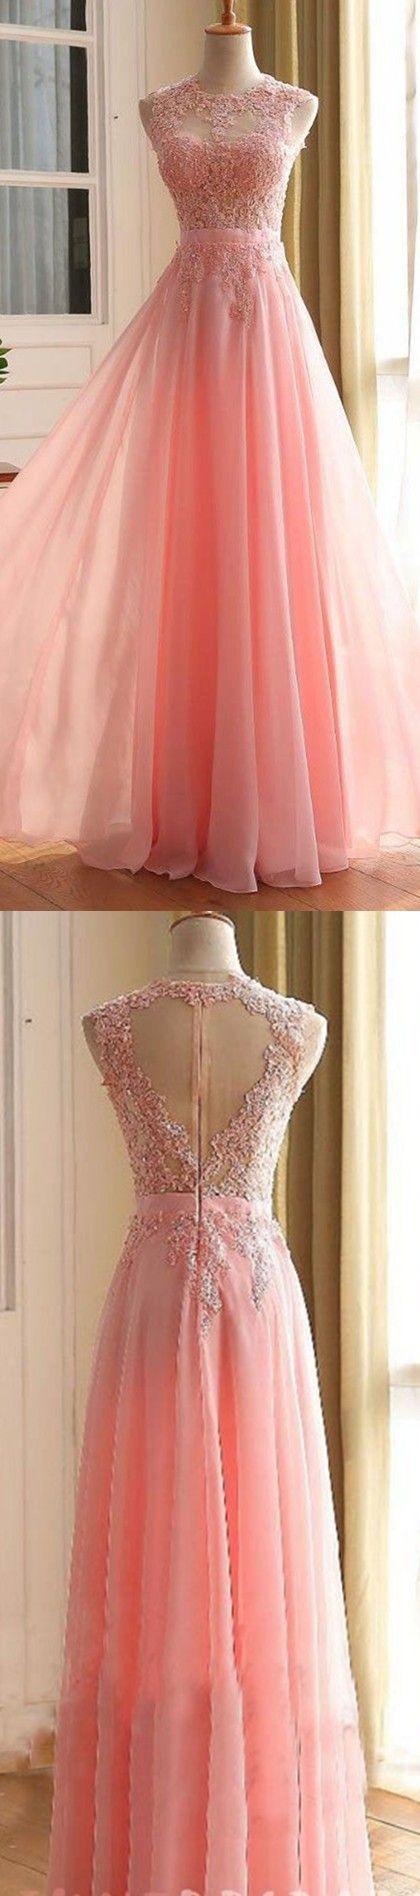 Prom Dresses 2017,Lace Appliques Prom Dresses, Floor Length: